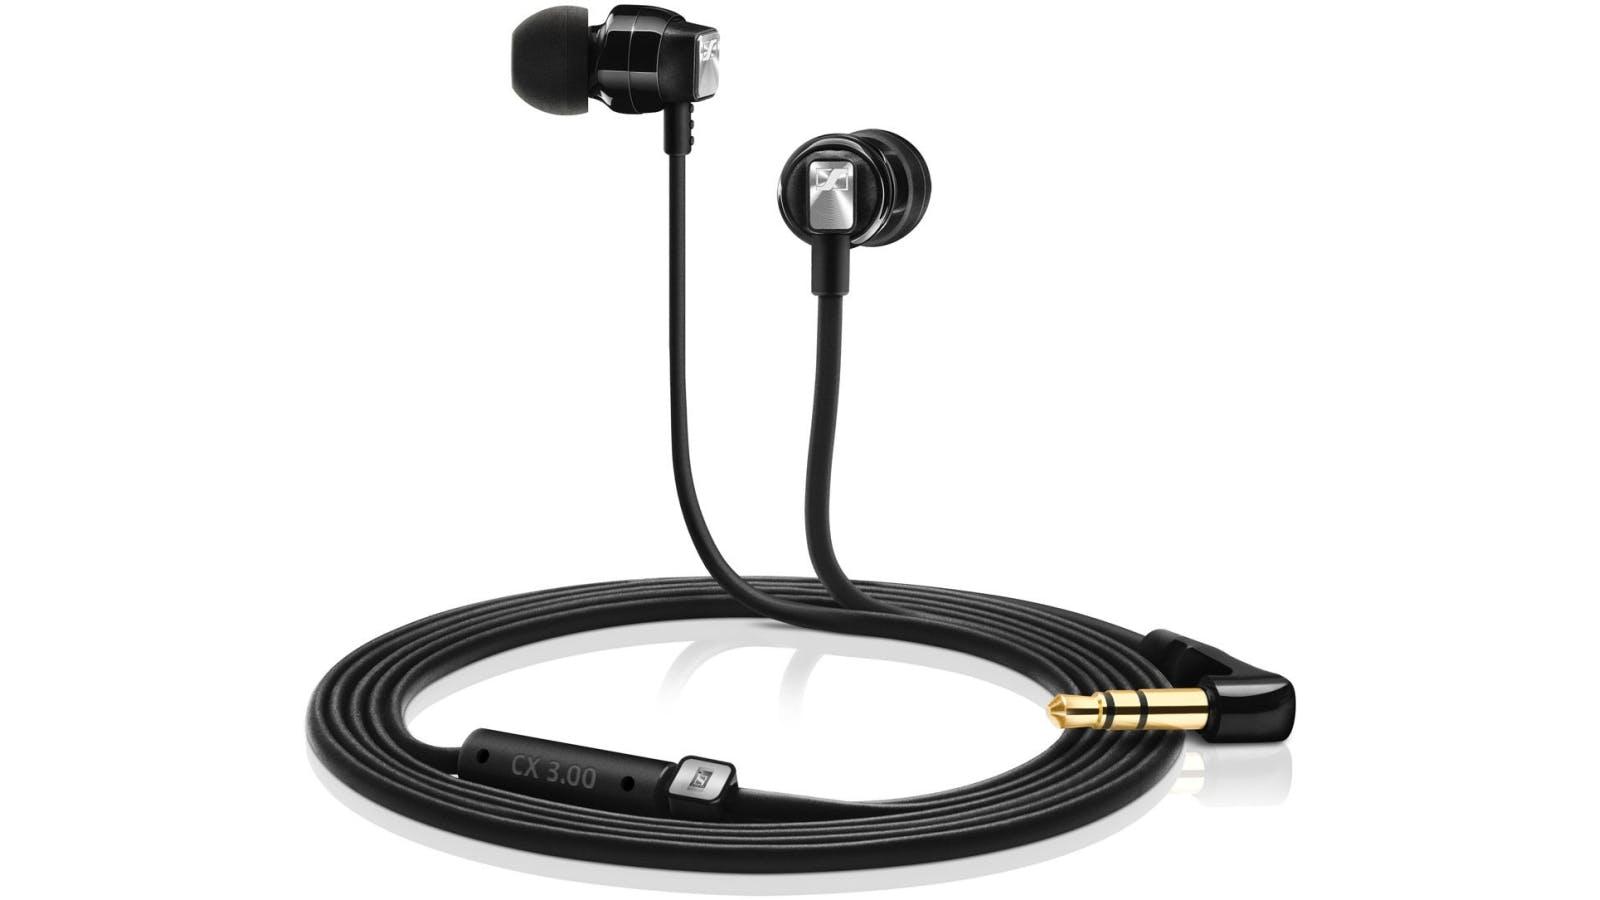 sennheiser cx in ear headphones harvey norman new zealand. Black Bedroom Furniture Sets. Home Design Ideas